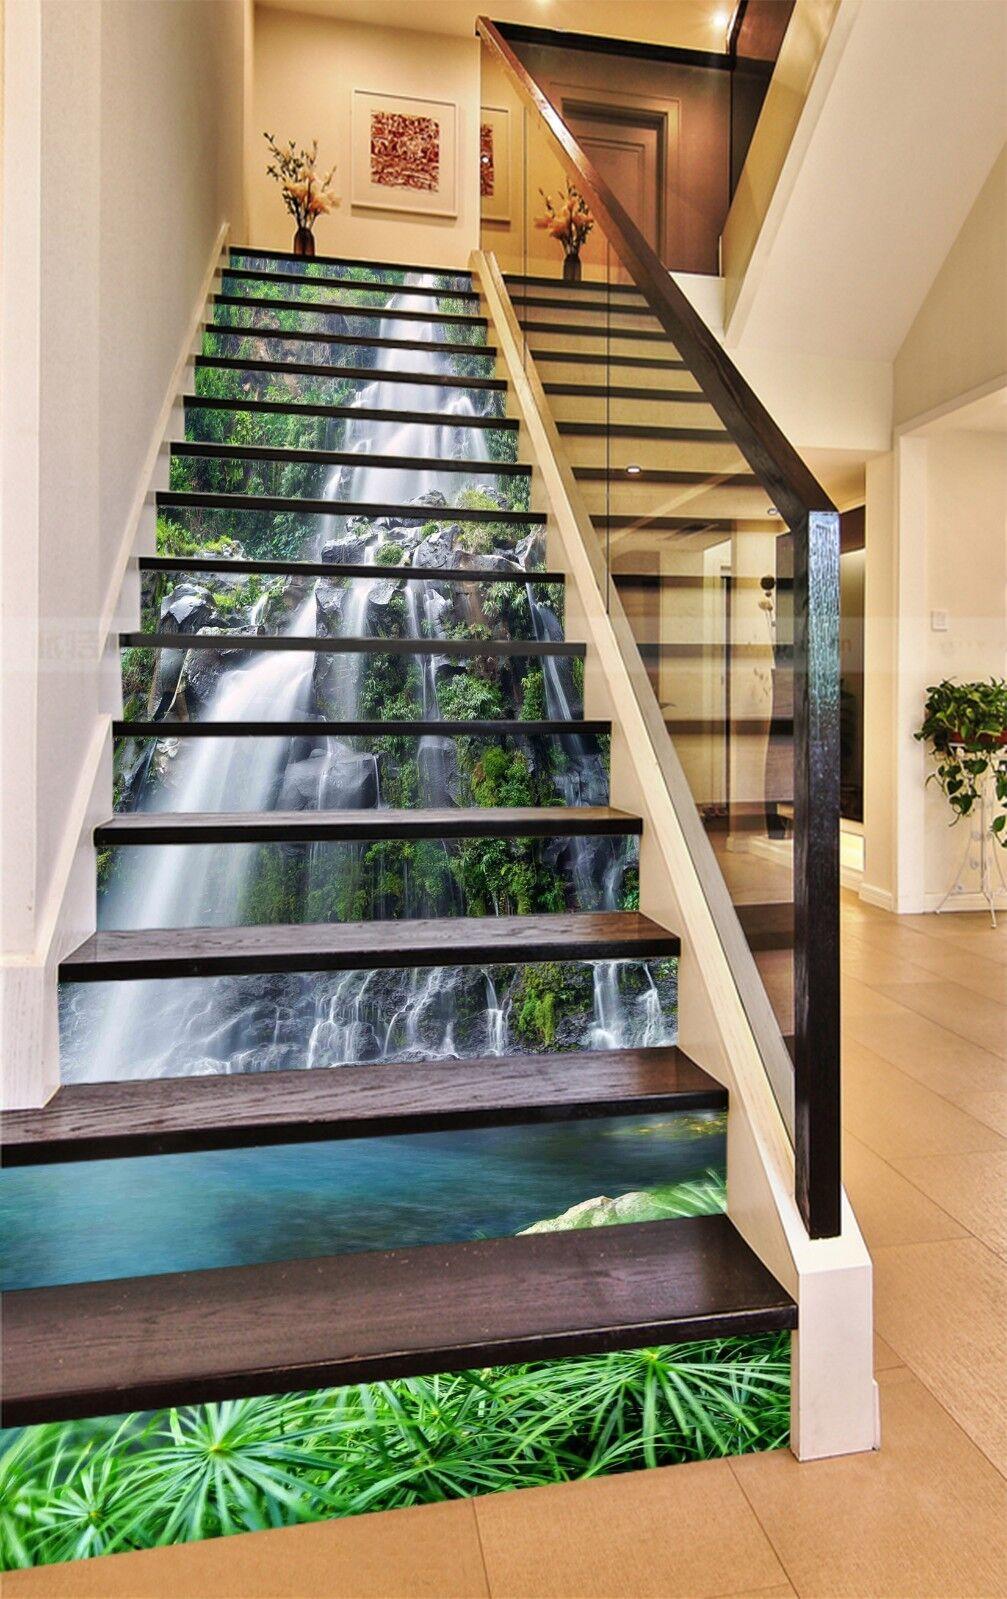 3D Wasserfall 1422 Stair Risers Dekoration Fototapete Vinyl Aufkleber Tapete DE